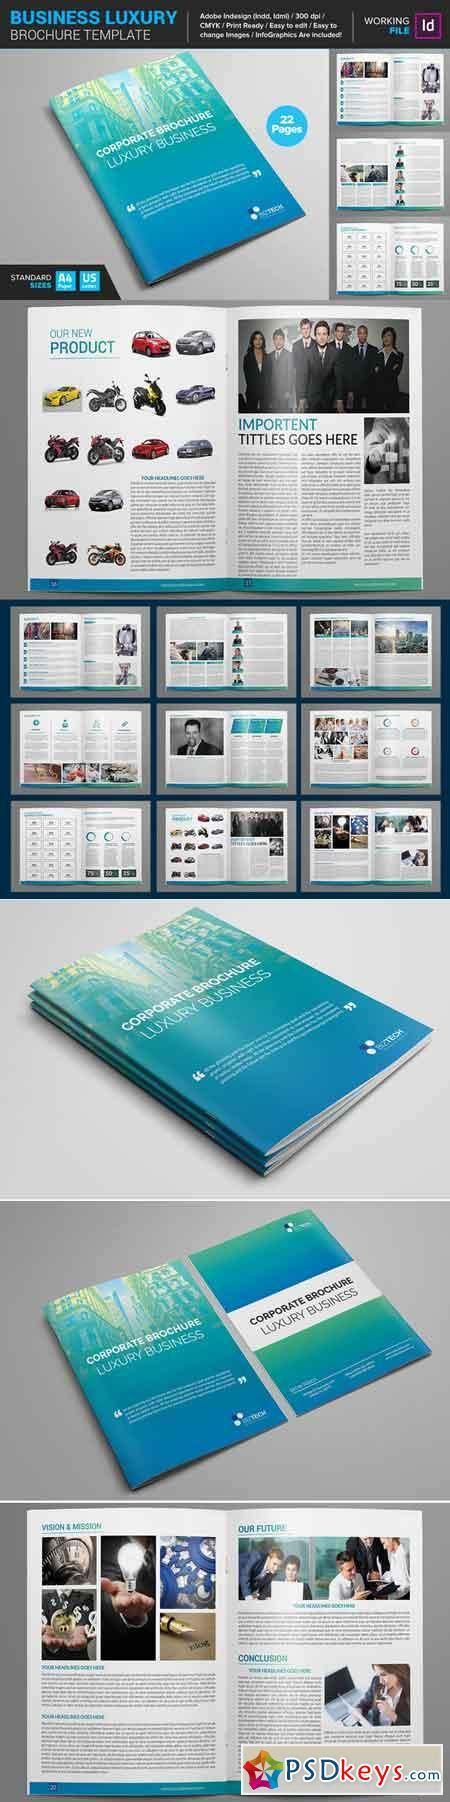 Luxury Brochure Template by Business Luxury Brochure Template 661817 187 Free